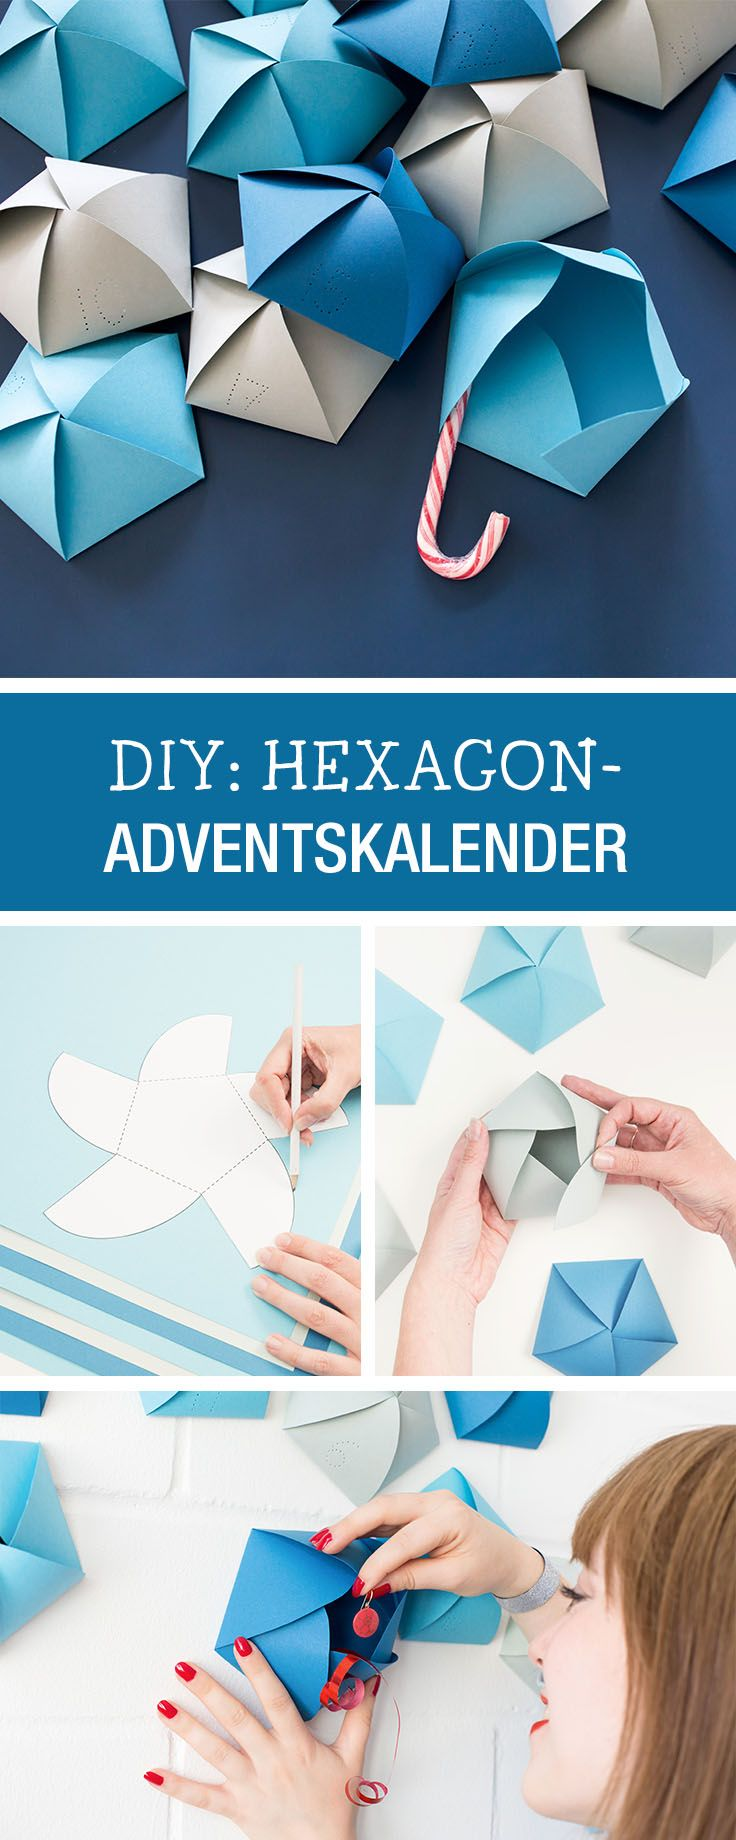 Minimalistischer Adventskalender aus Papier, Origami-Anleitung / minimalistic advents calendar made of paper via DaWanda.com